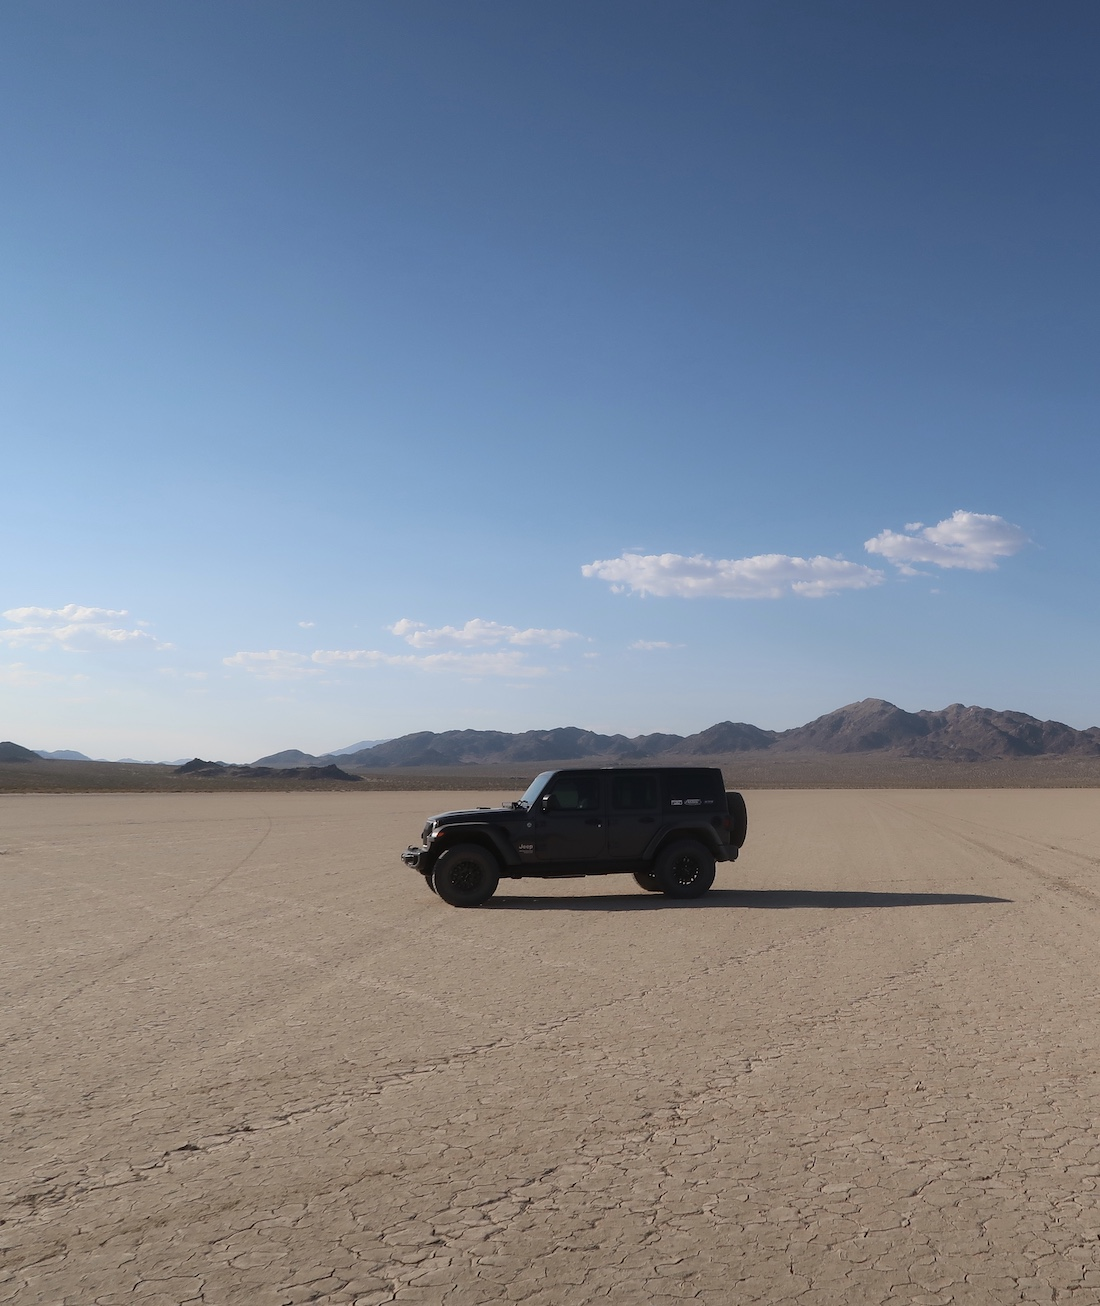 Vehicle: